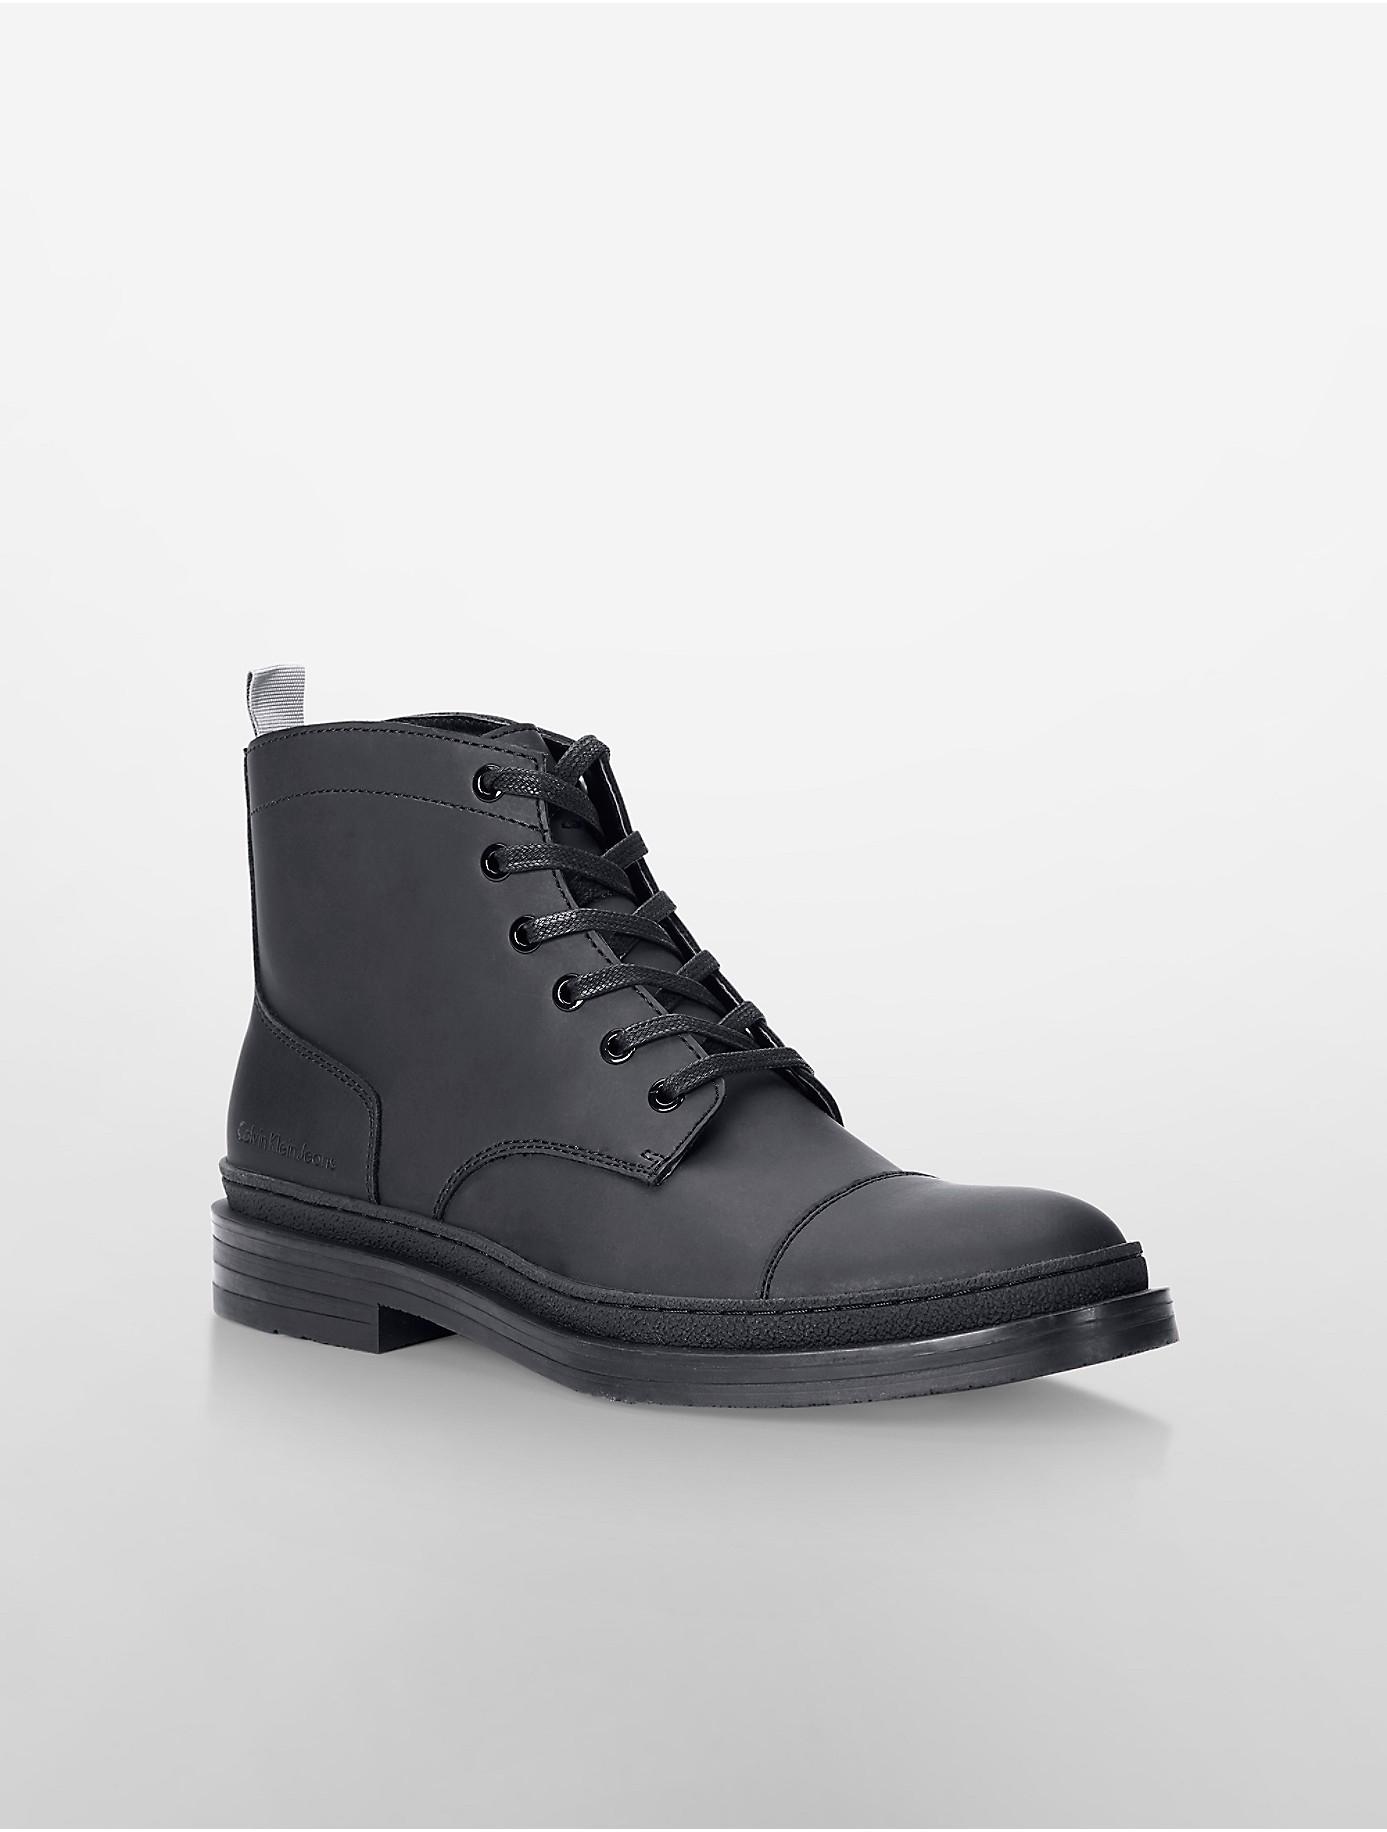 Lyst - Calvin Klein Jeans Navid Boot in Black